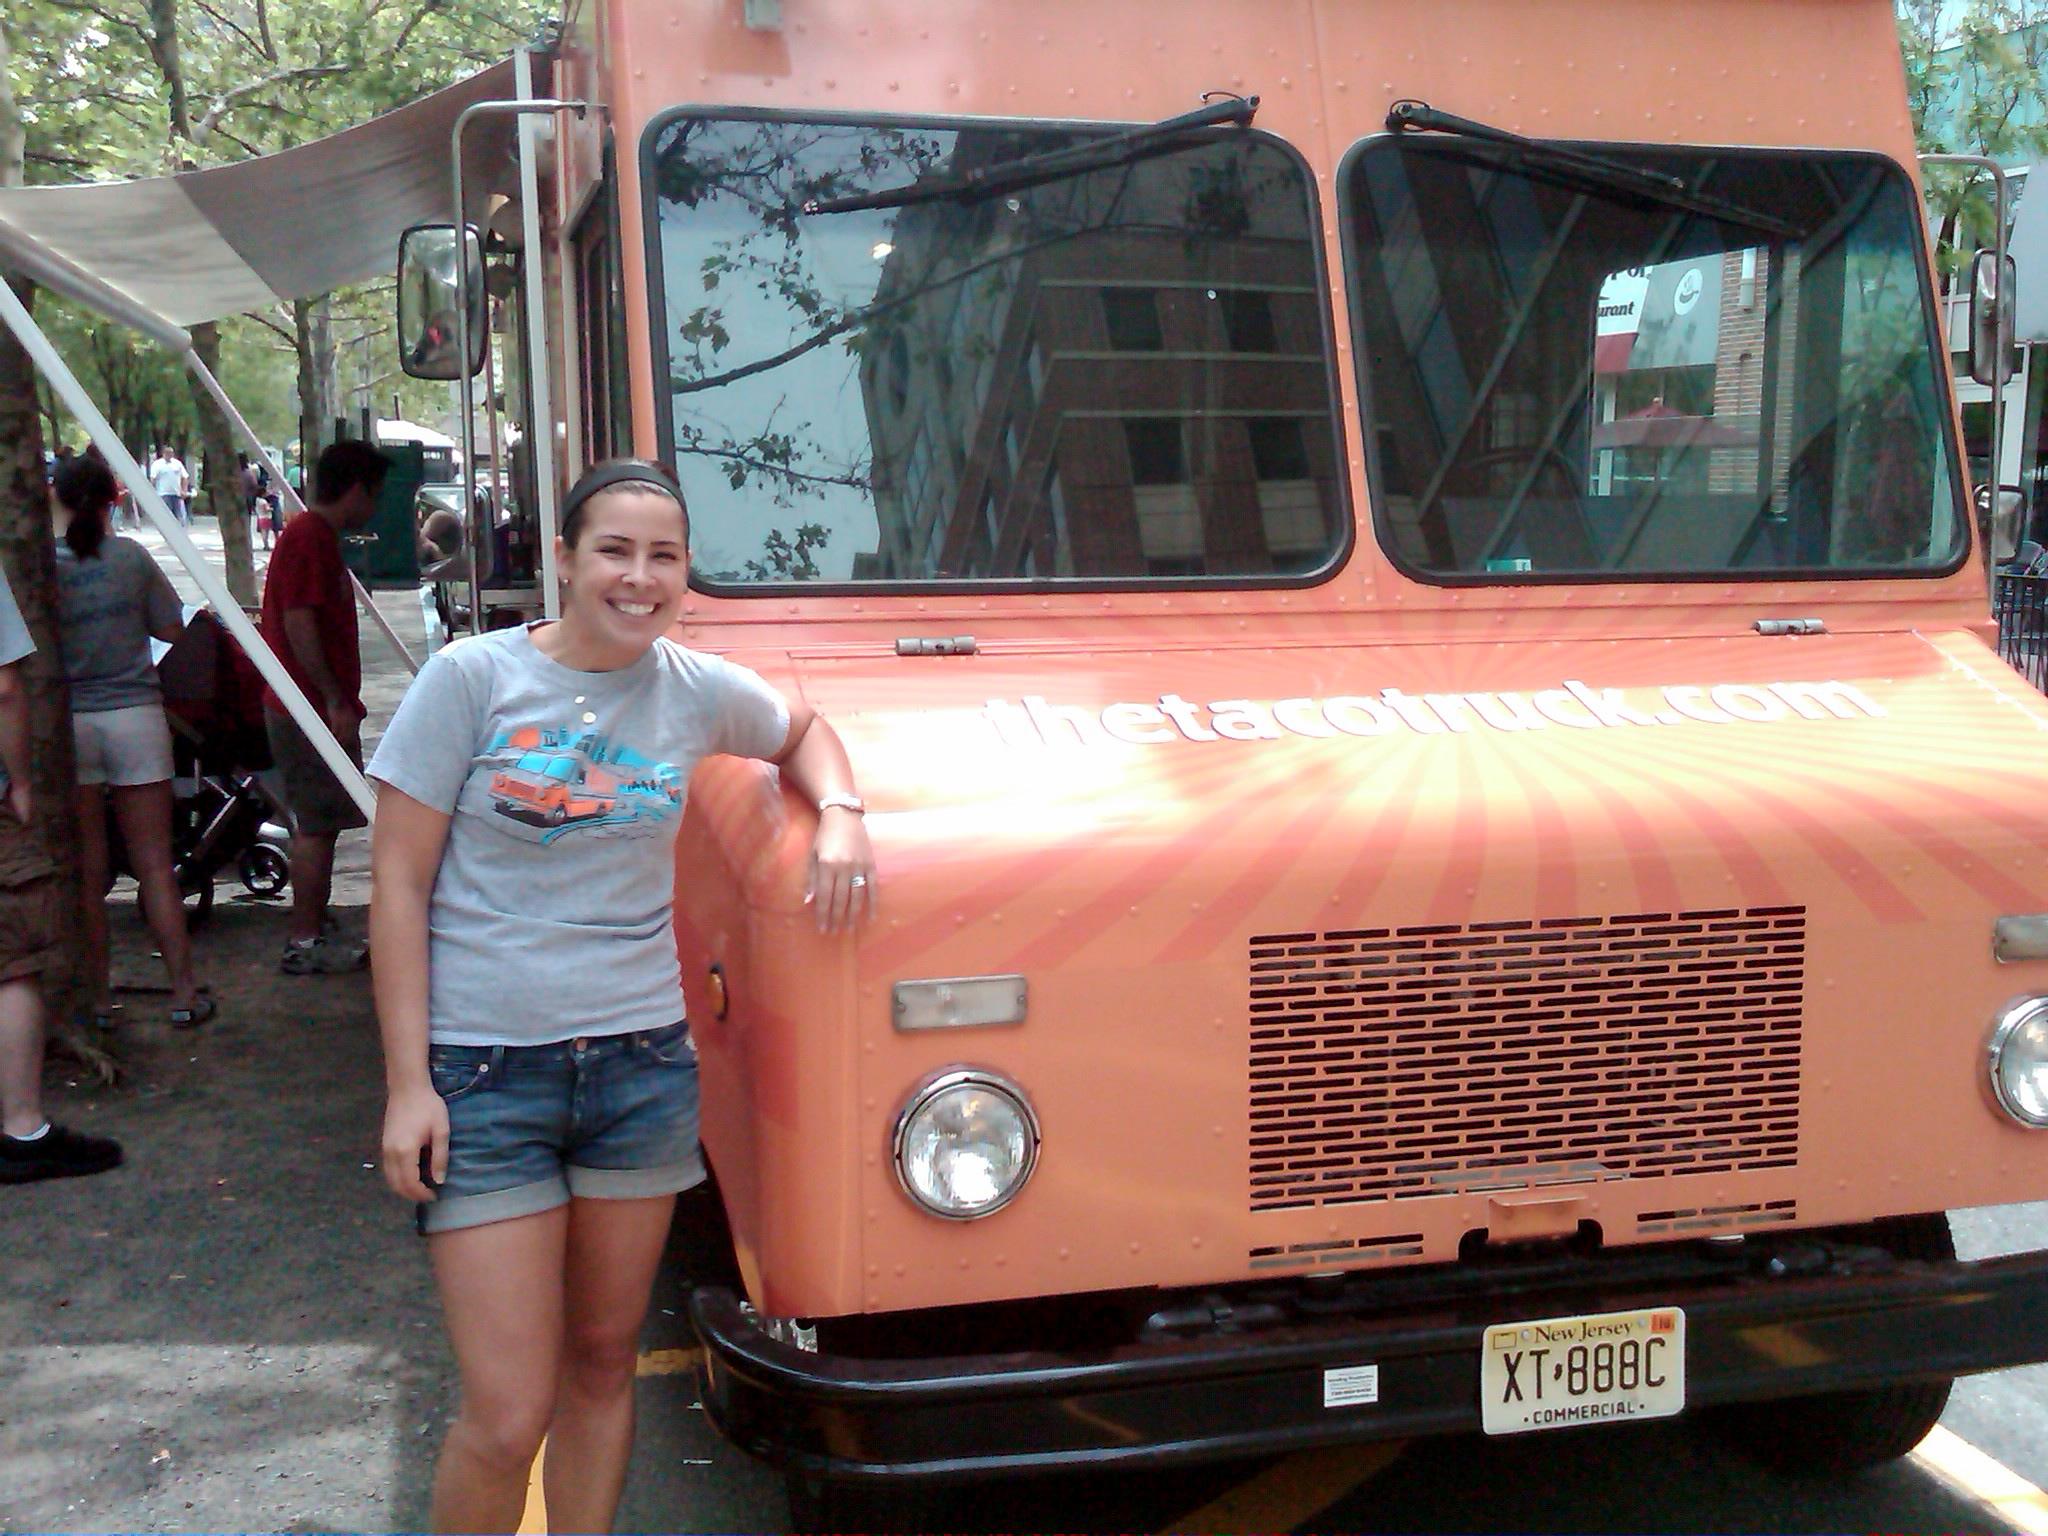 Shachar Scott at The Taco Truck